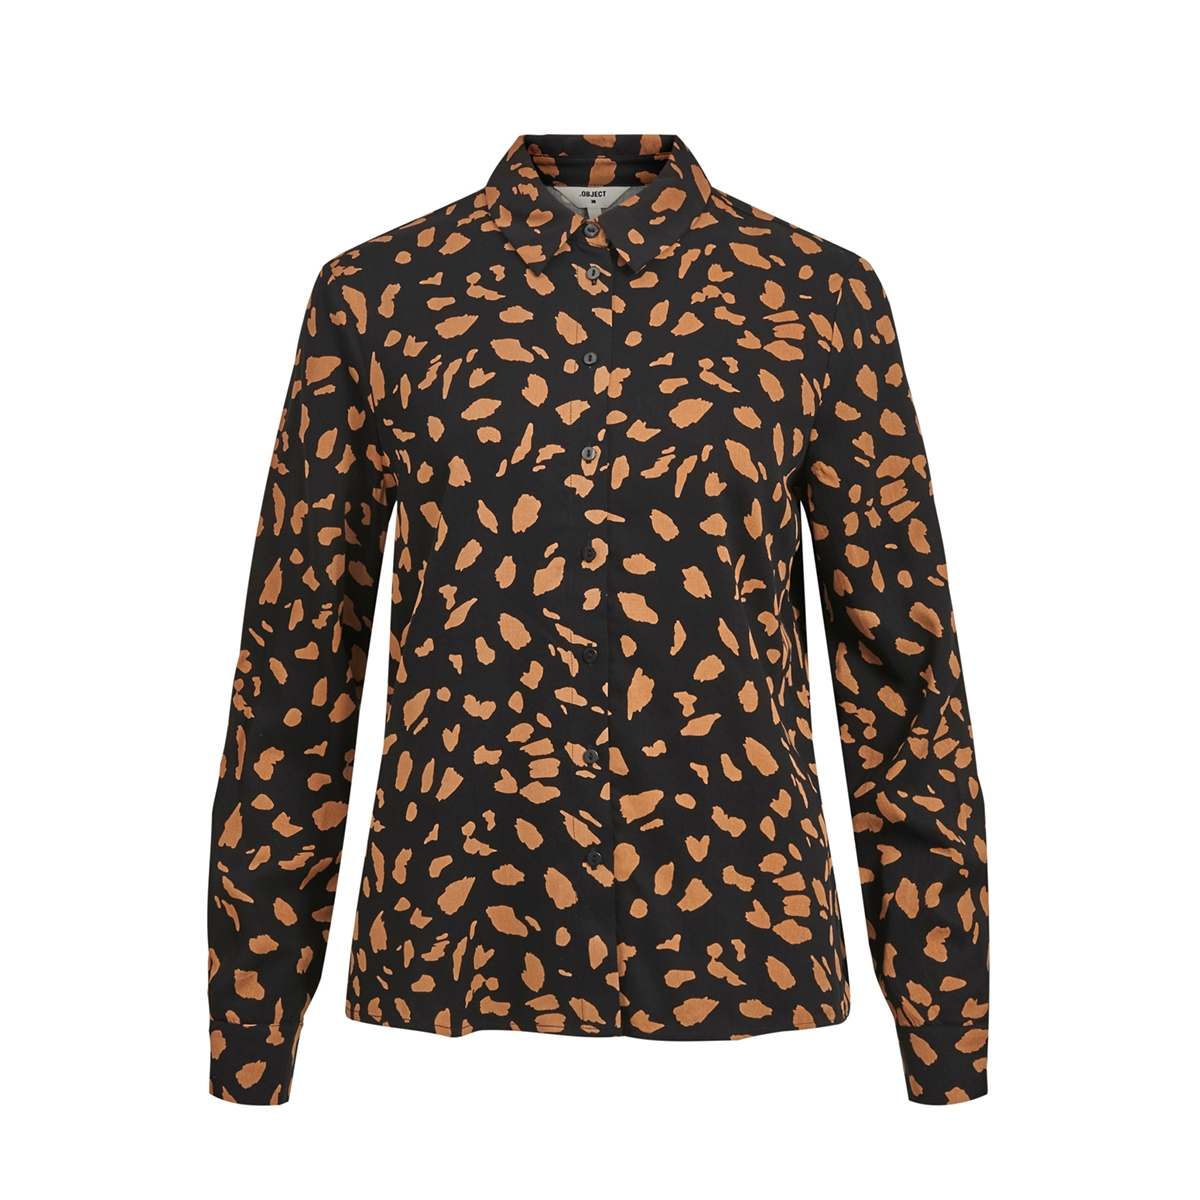 objbaya l/s shirt aop seasonal 23033333 object blouse black/chipmunks